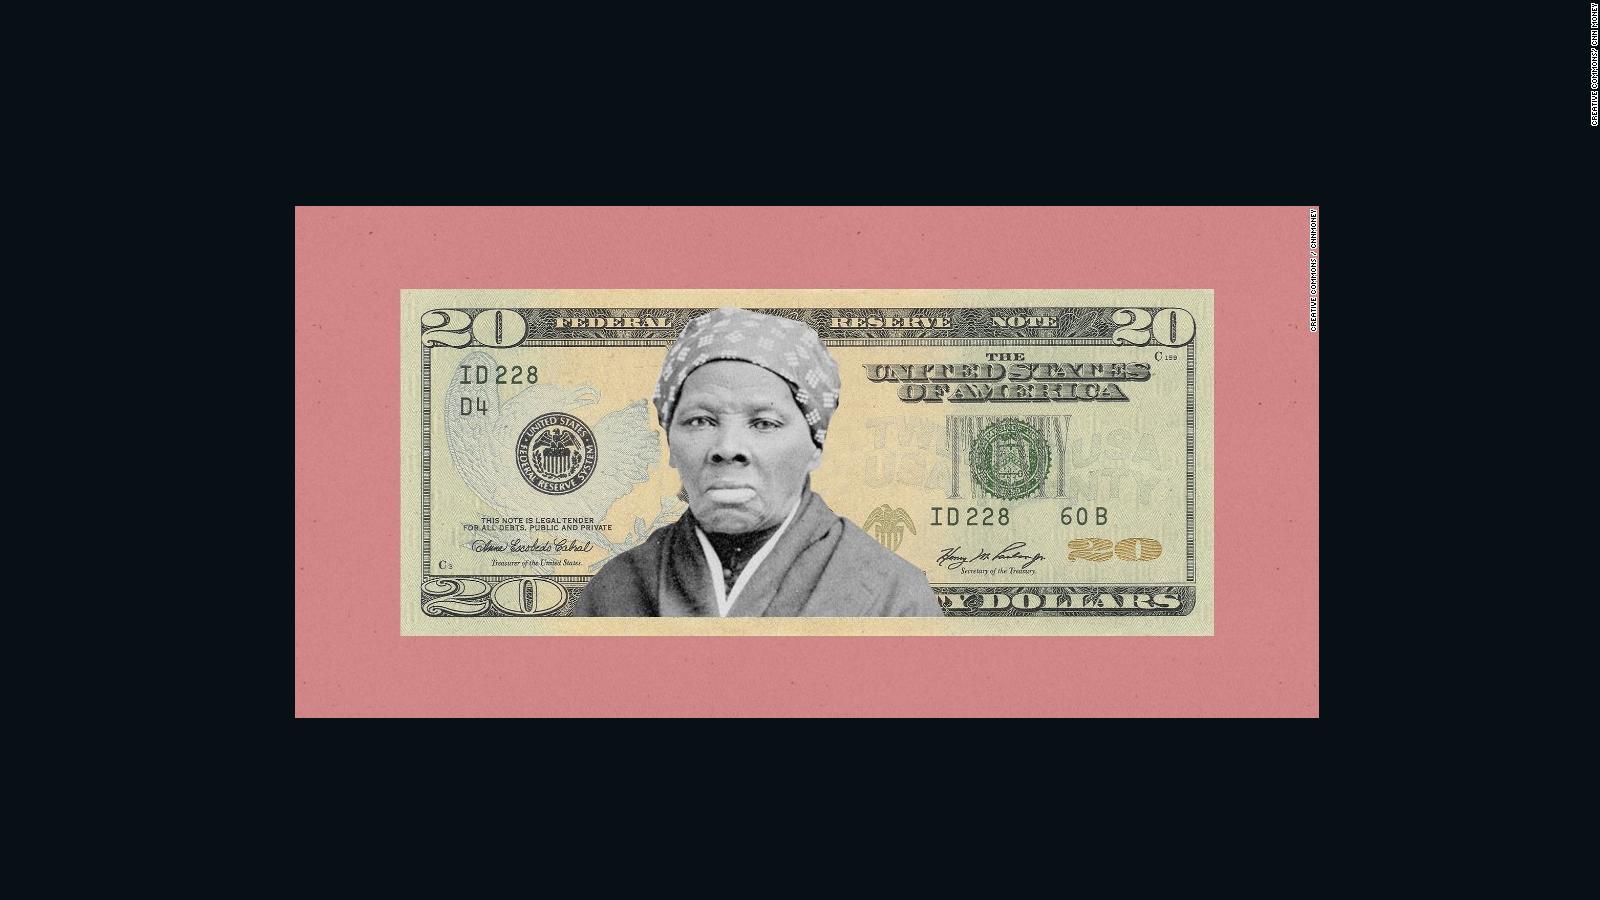 The real reason Trump won't put Harriet Tubman on $20 bill (opinion